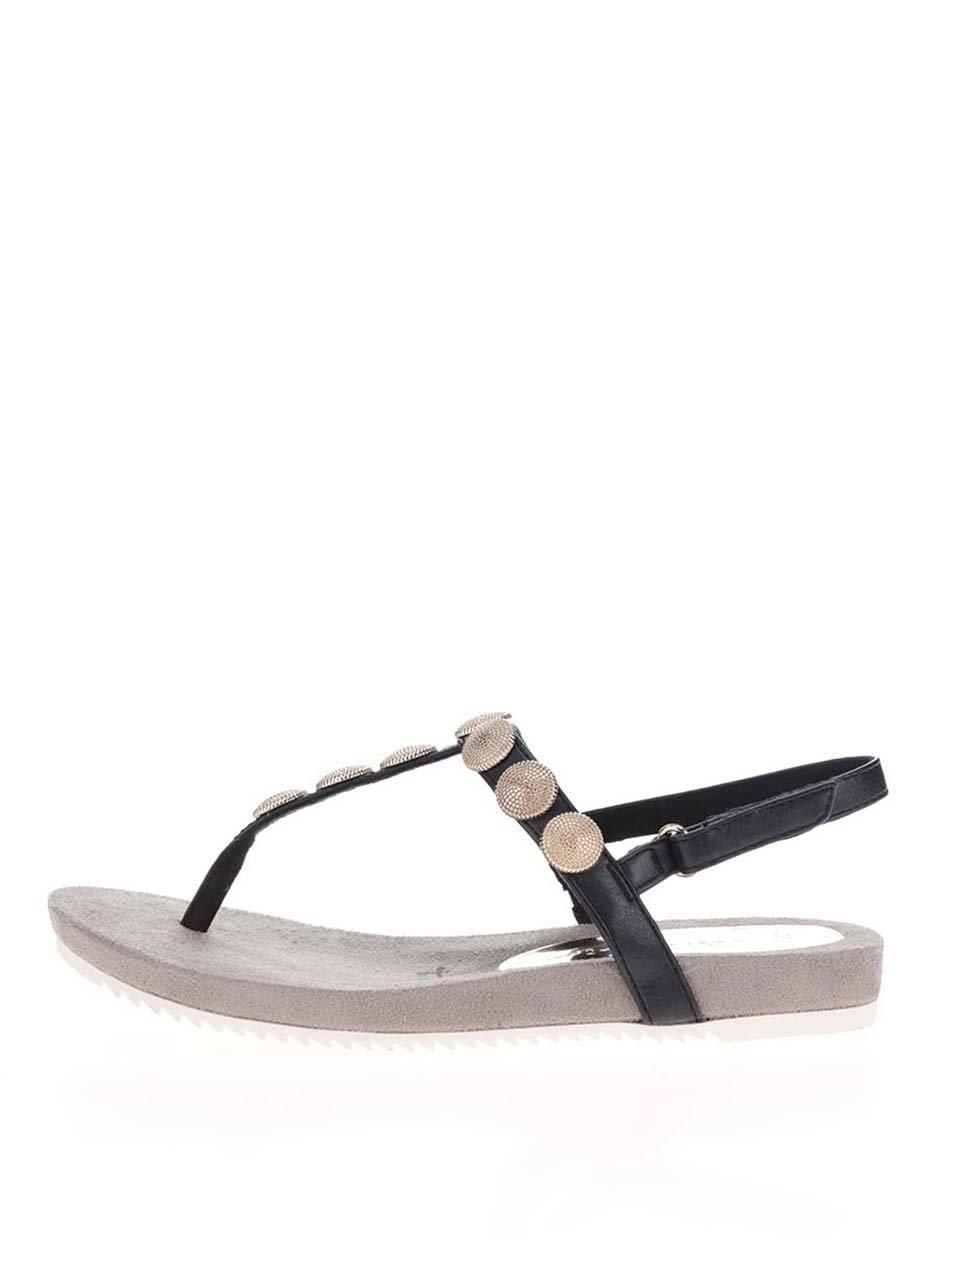 4218658f66c0 Čierne sandále s detailmi v zlatej farbe Tamaris ...